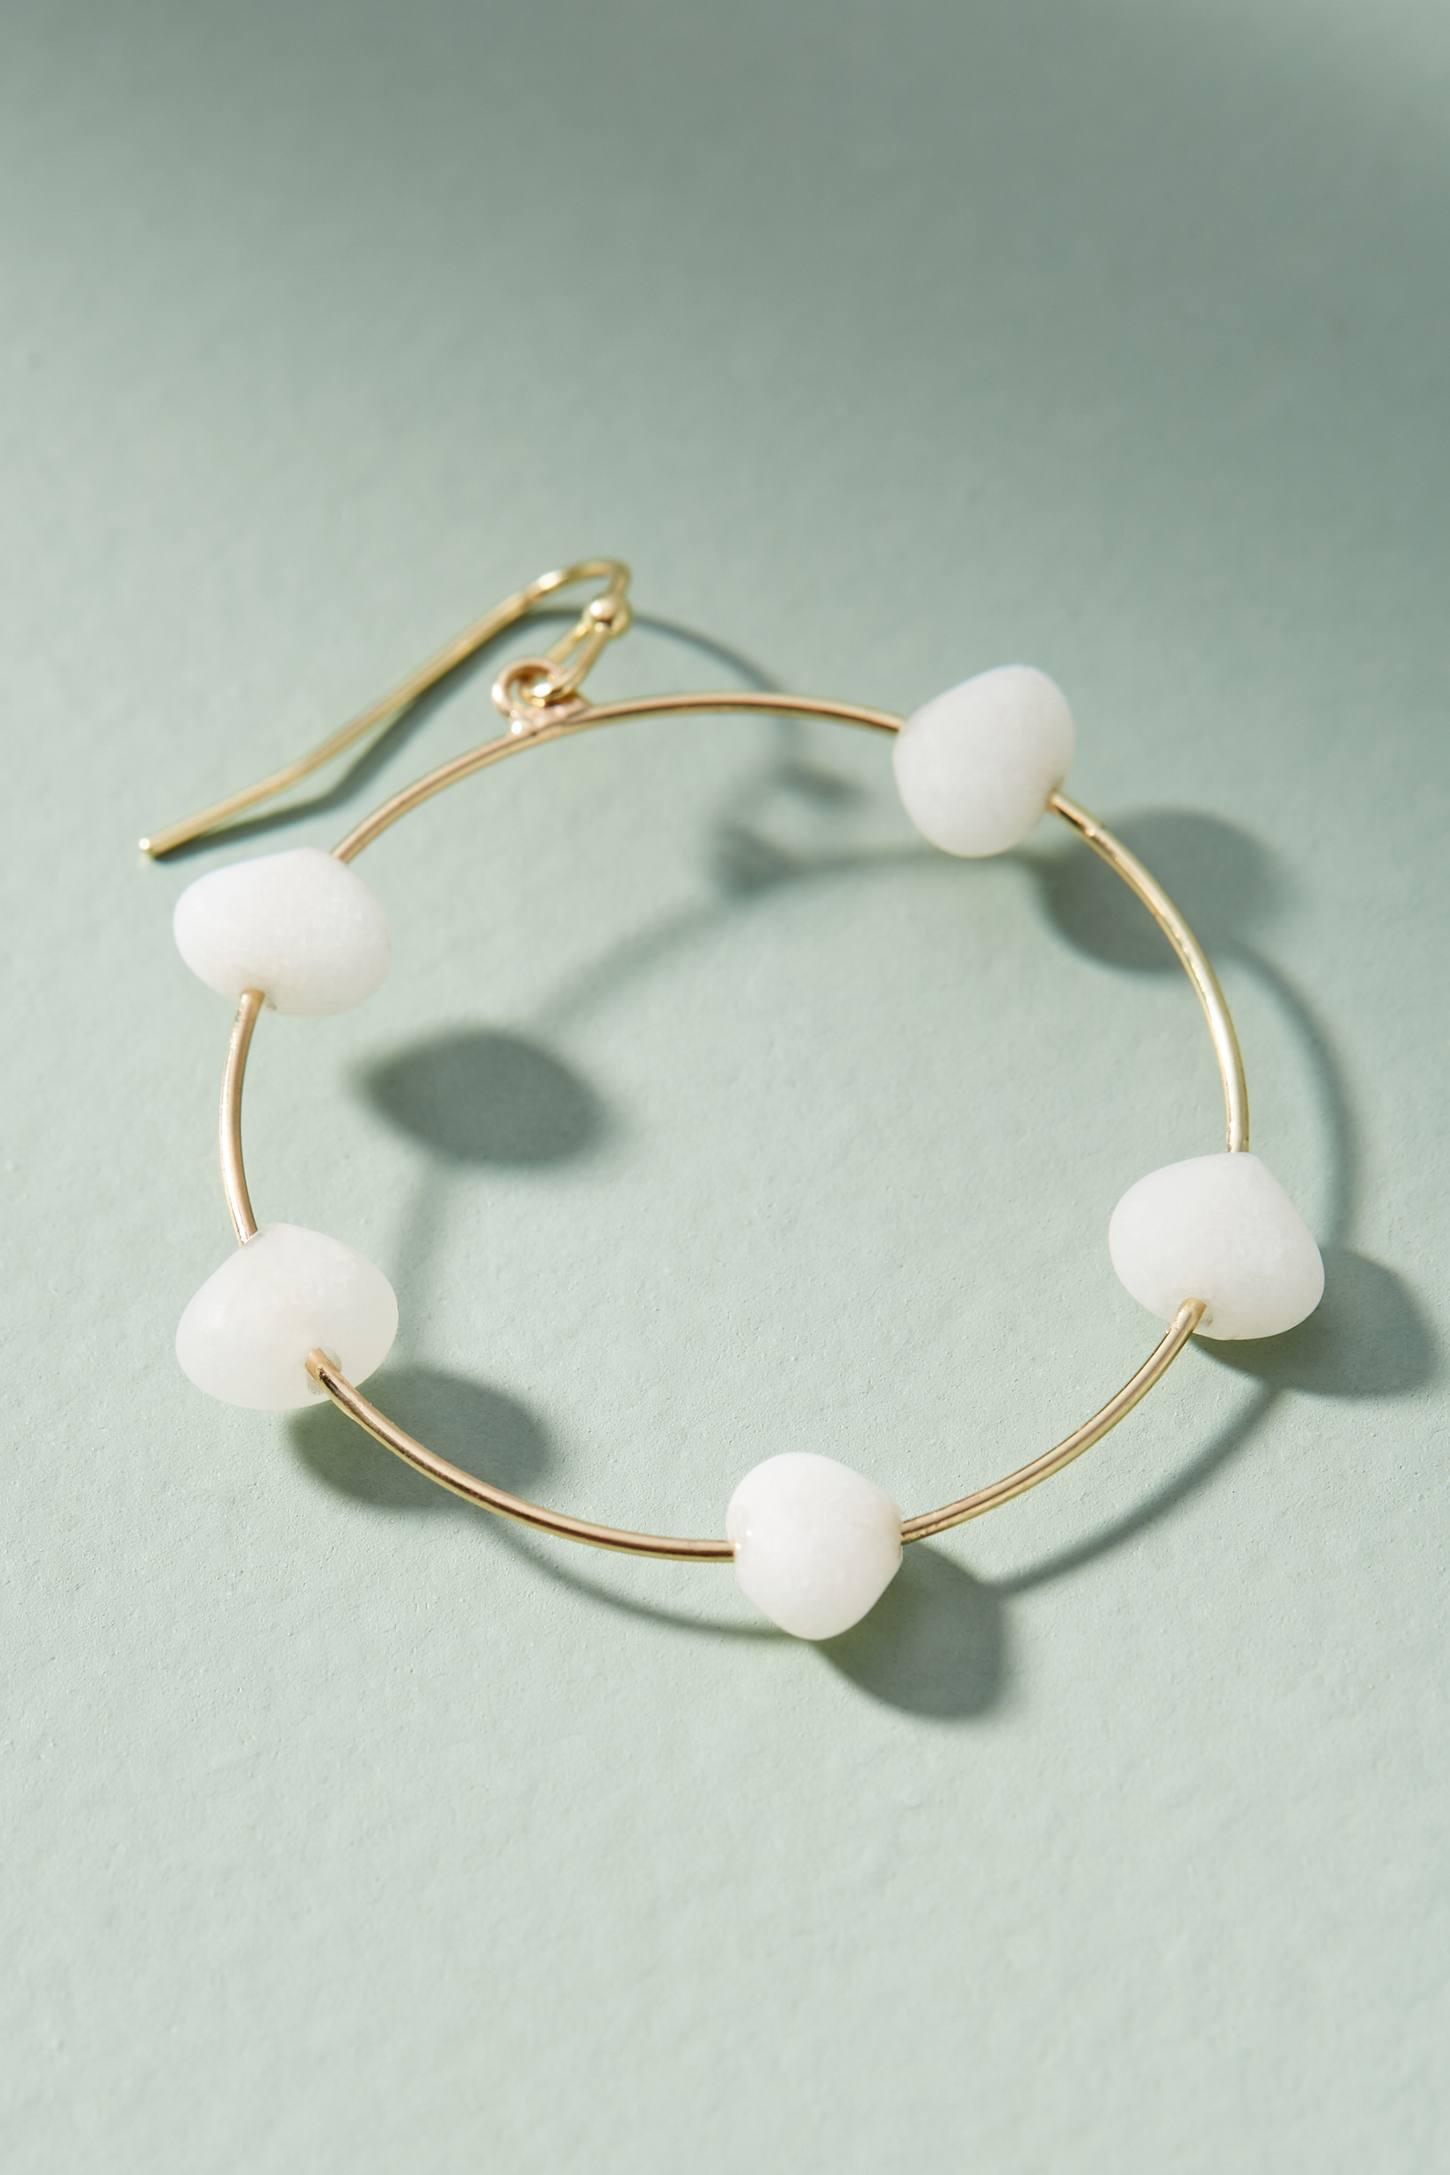 Anthropologie Maria Stone Hooped Drop Earrings II7nsC0